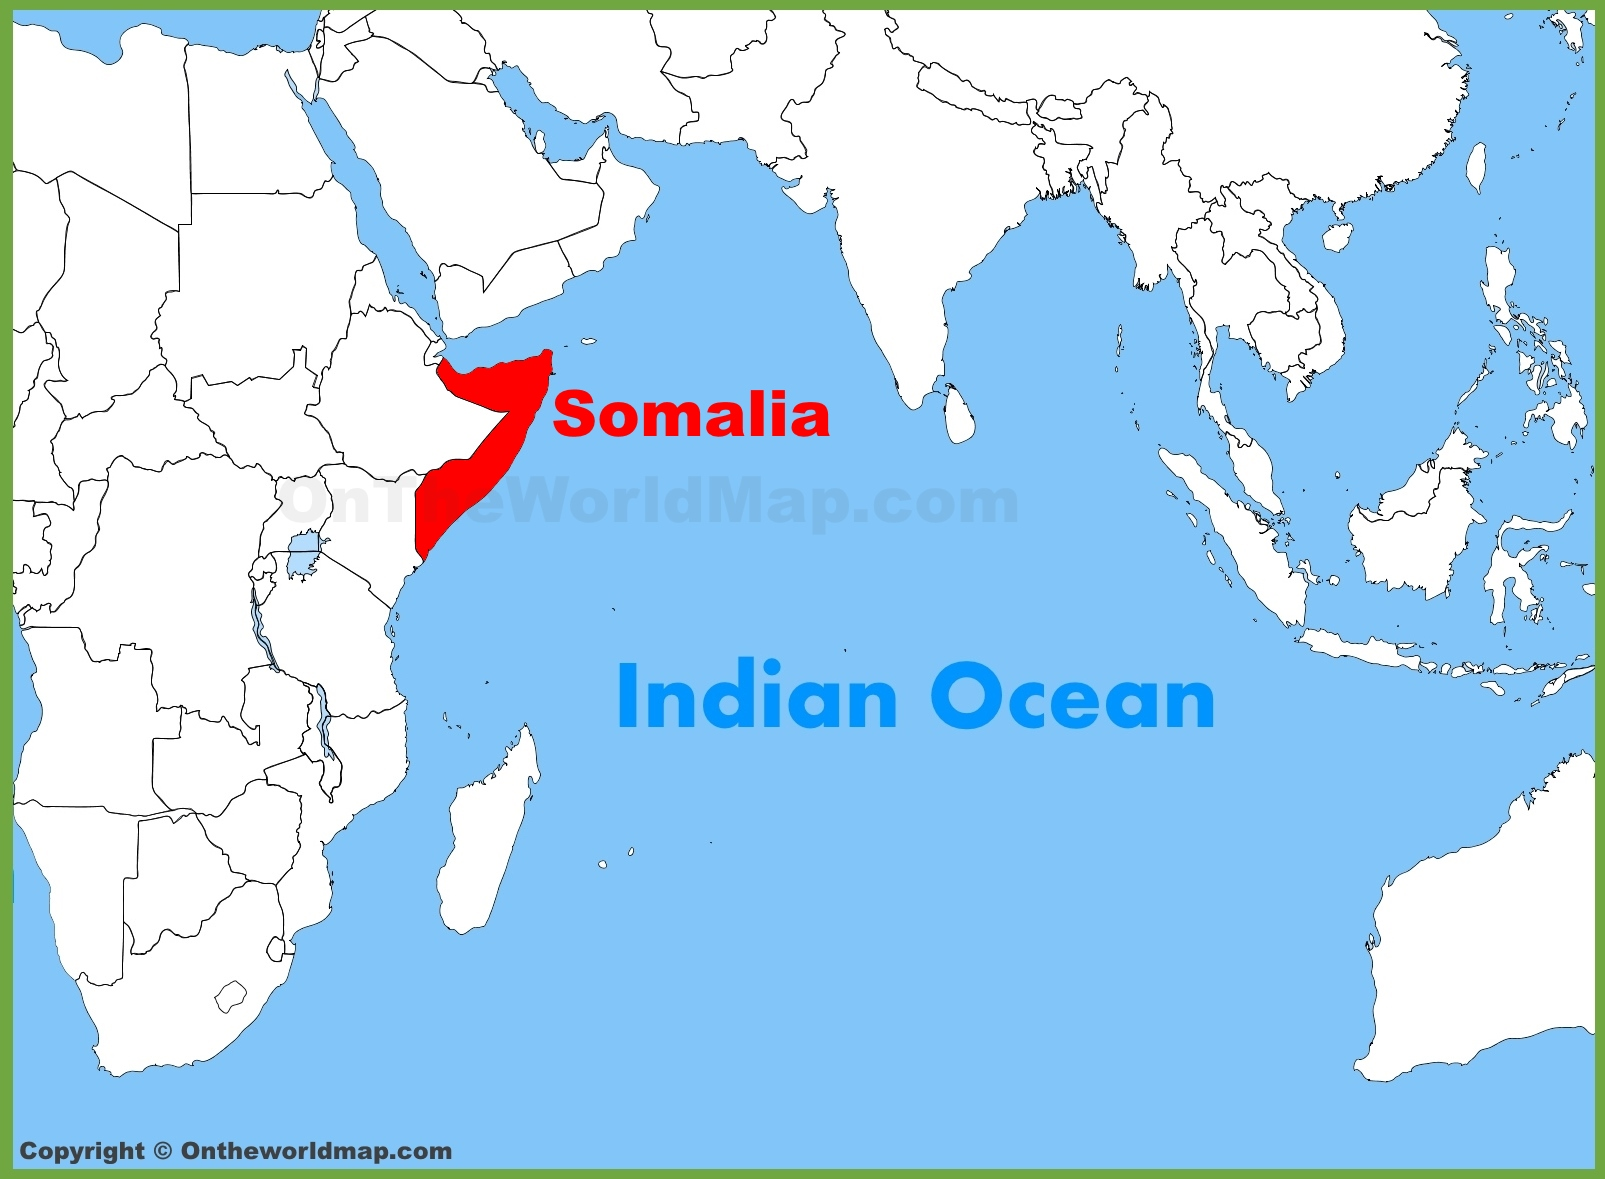 Somalia On World Map Somalia location on the Indian Ocean map Somalia On World Map